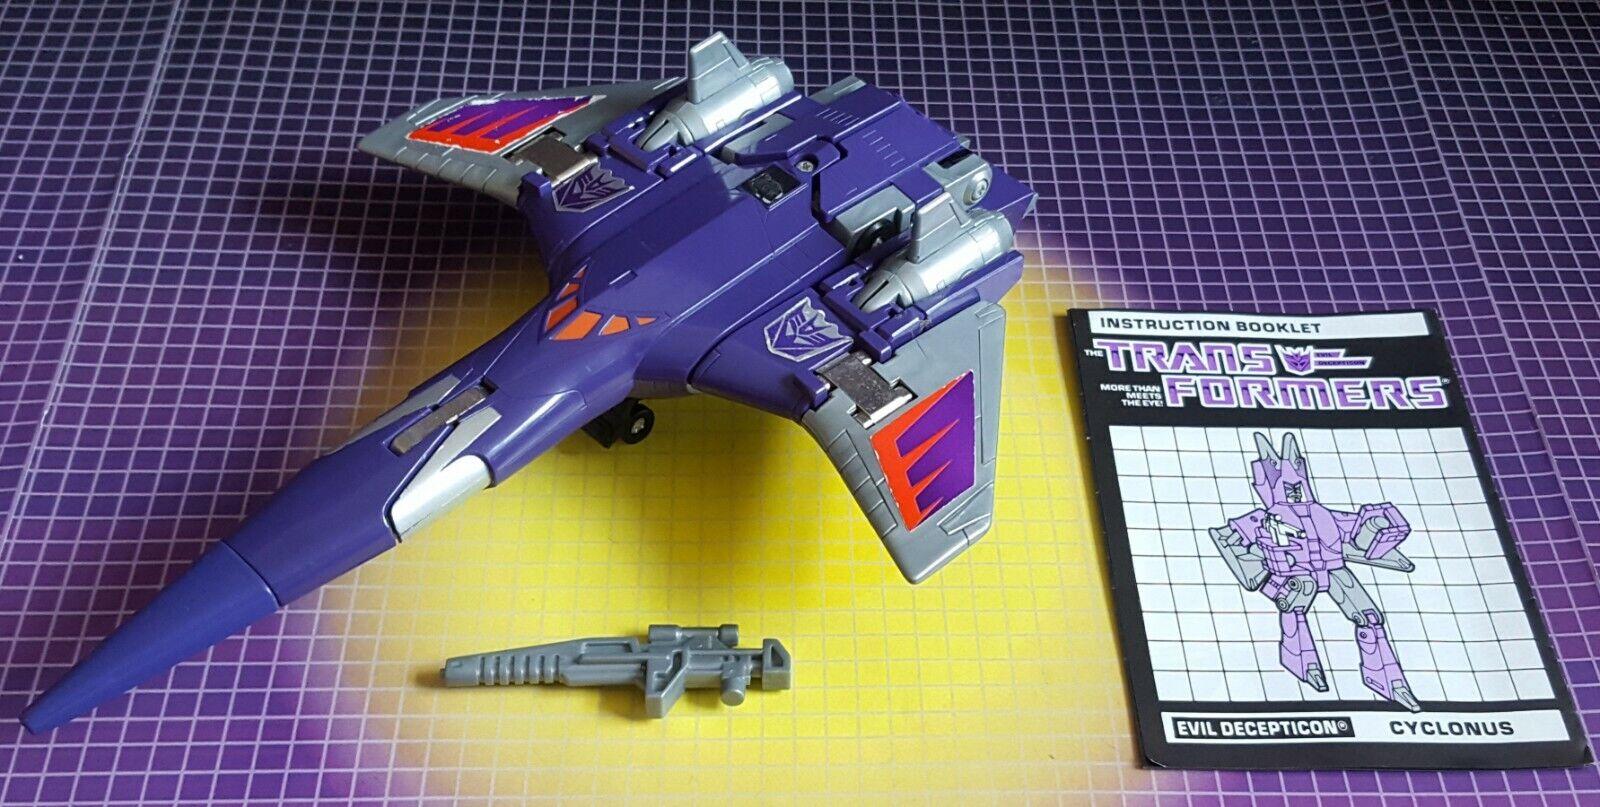 Vintage Hasbro Transformers G1 Decepticon Jet Cyclonus Complete w Instructions